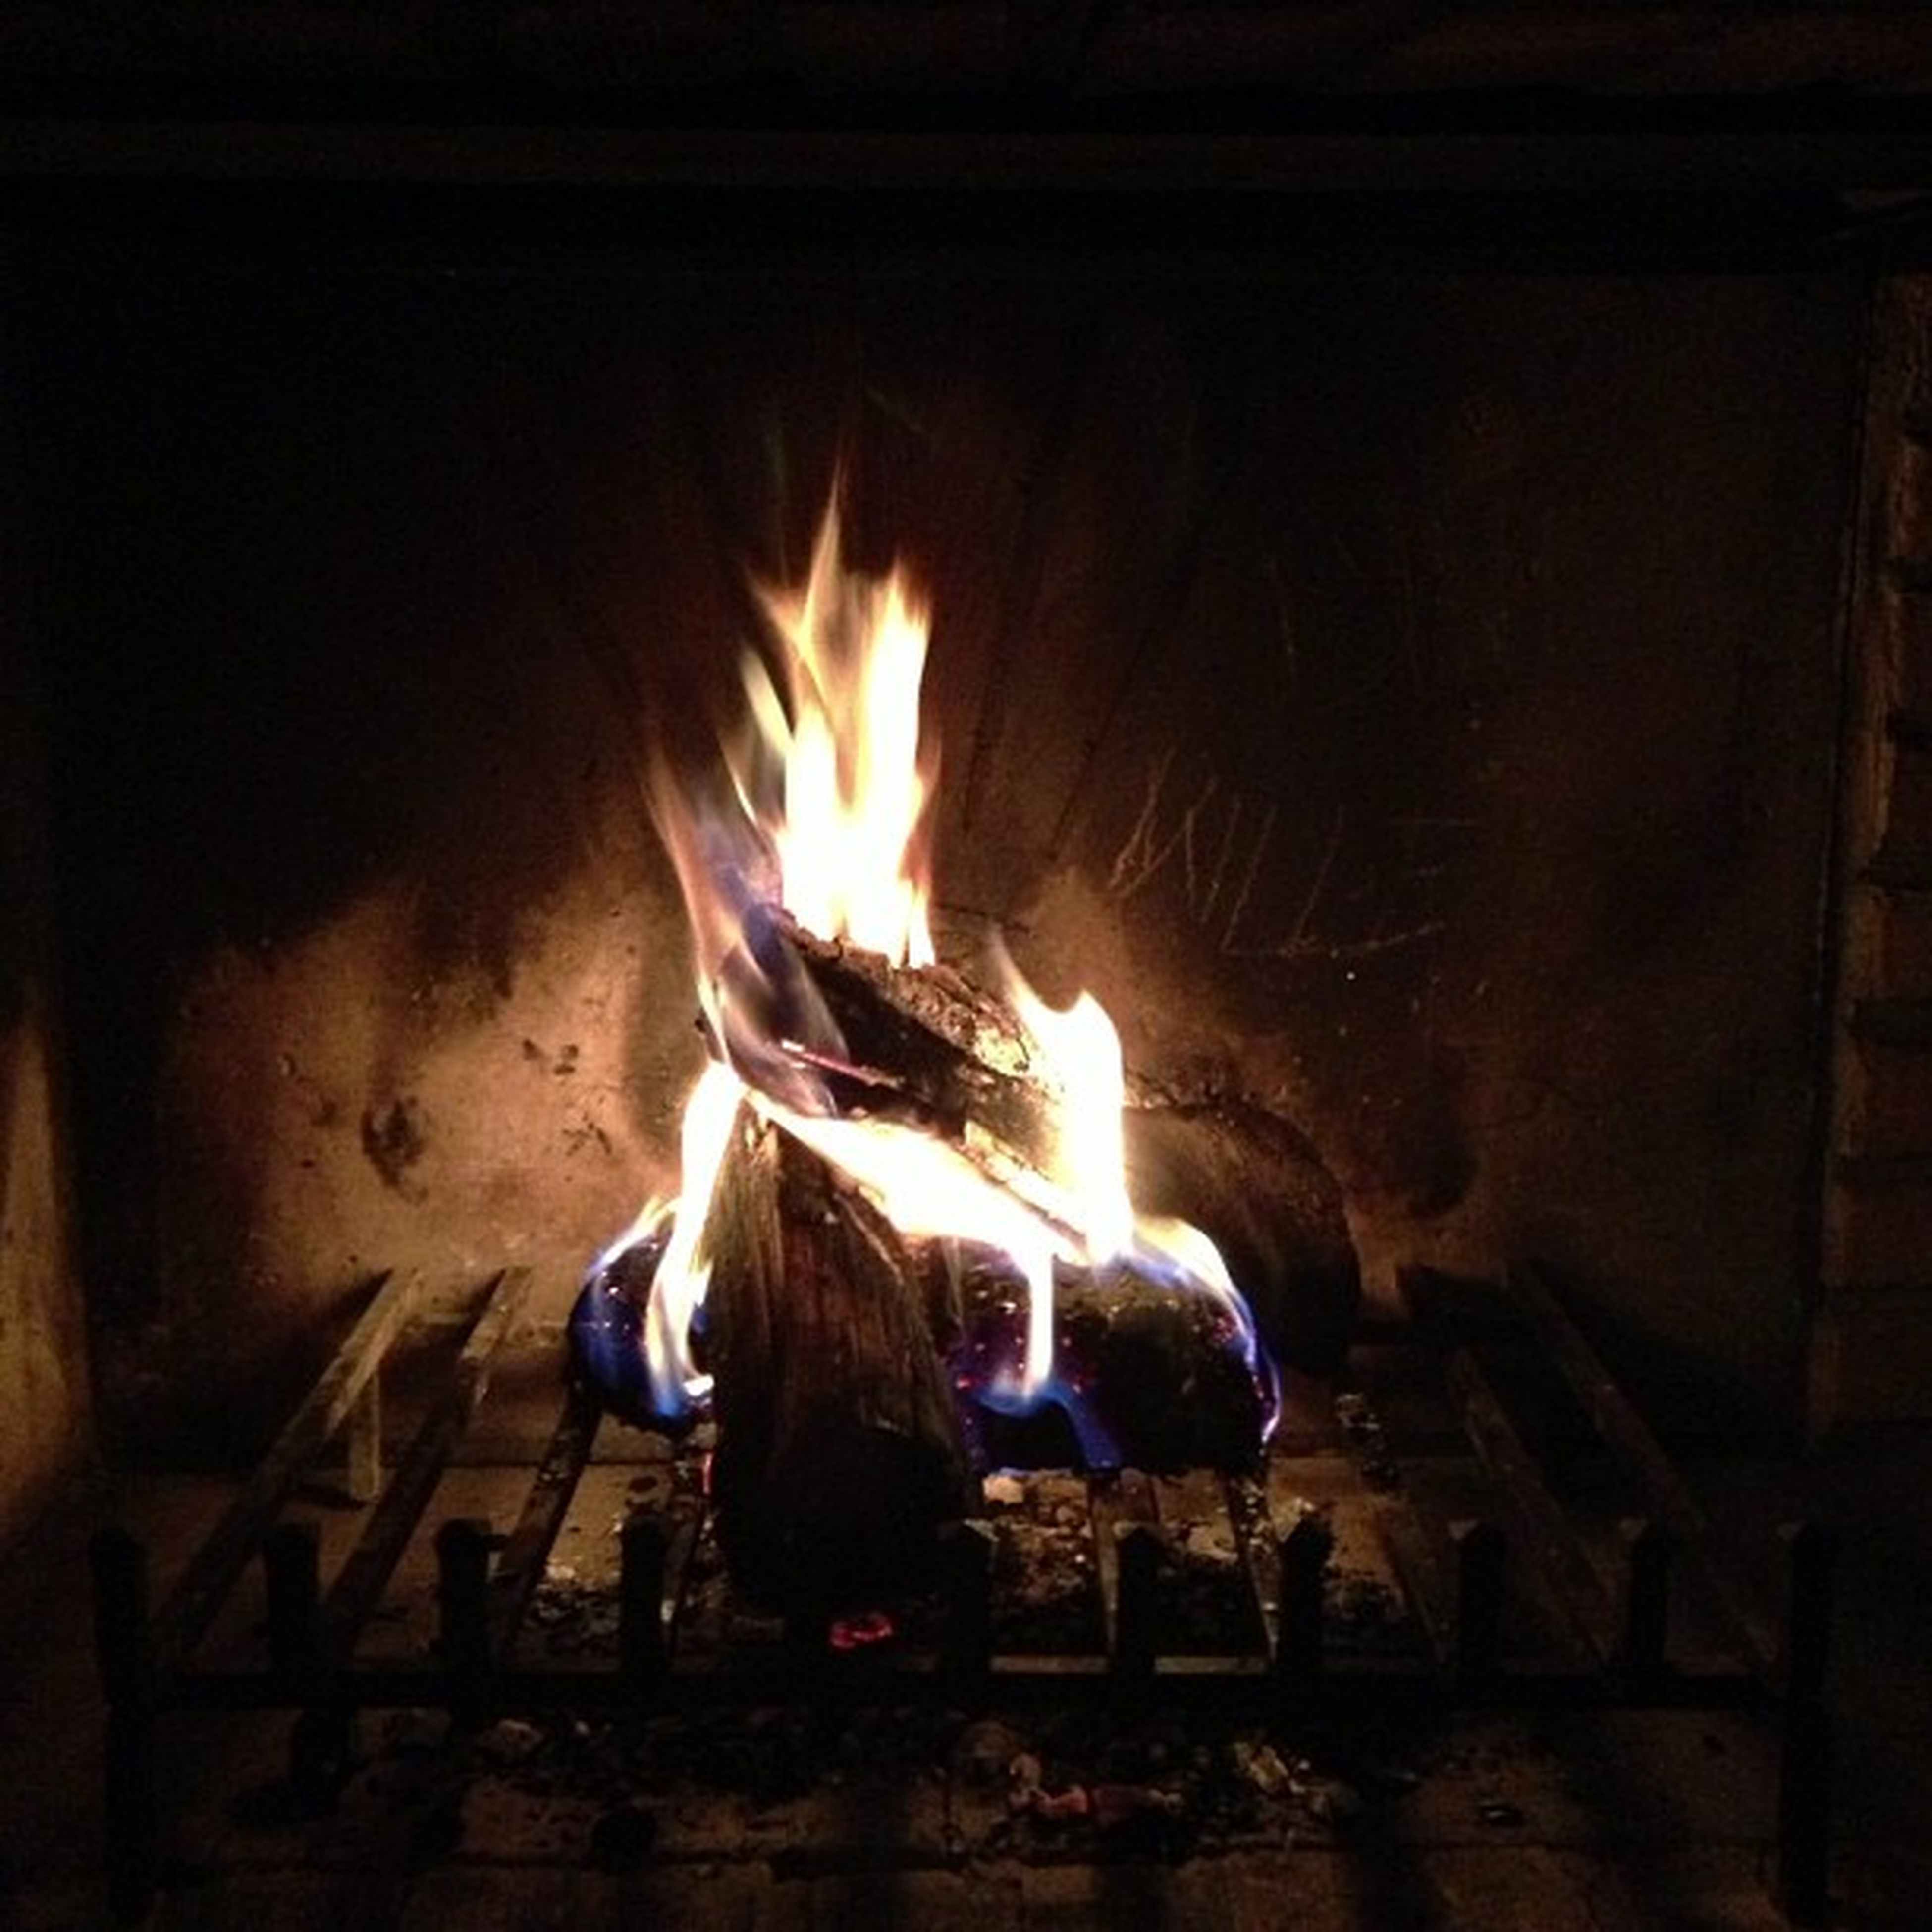 flame, burning, fire - natural phenomenon, heat - temperature, indoors, illuminated, night, glowing, fire, firewood, bonfire, candle, dark, heat, fireplace, light - natural phenomenon, wood - material, lit, campfire, darkroom